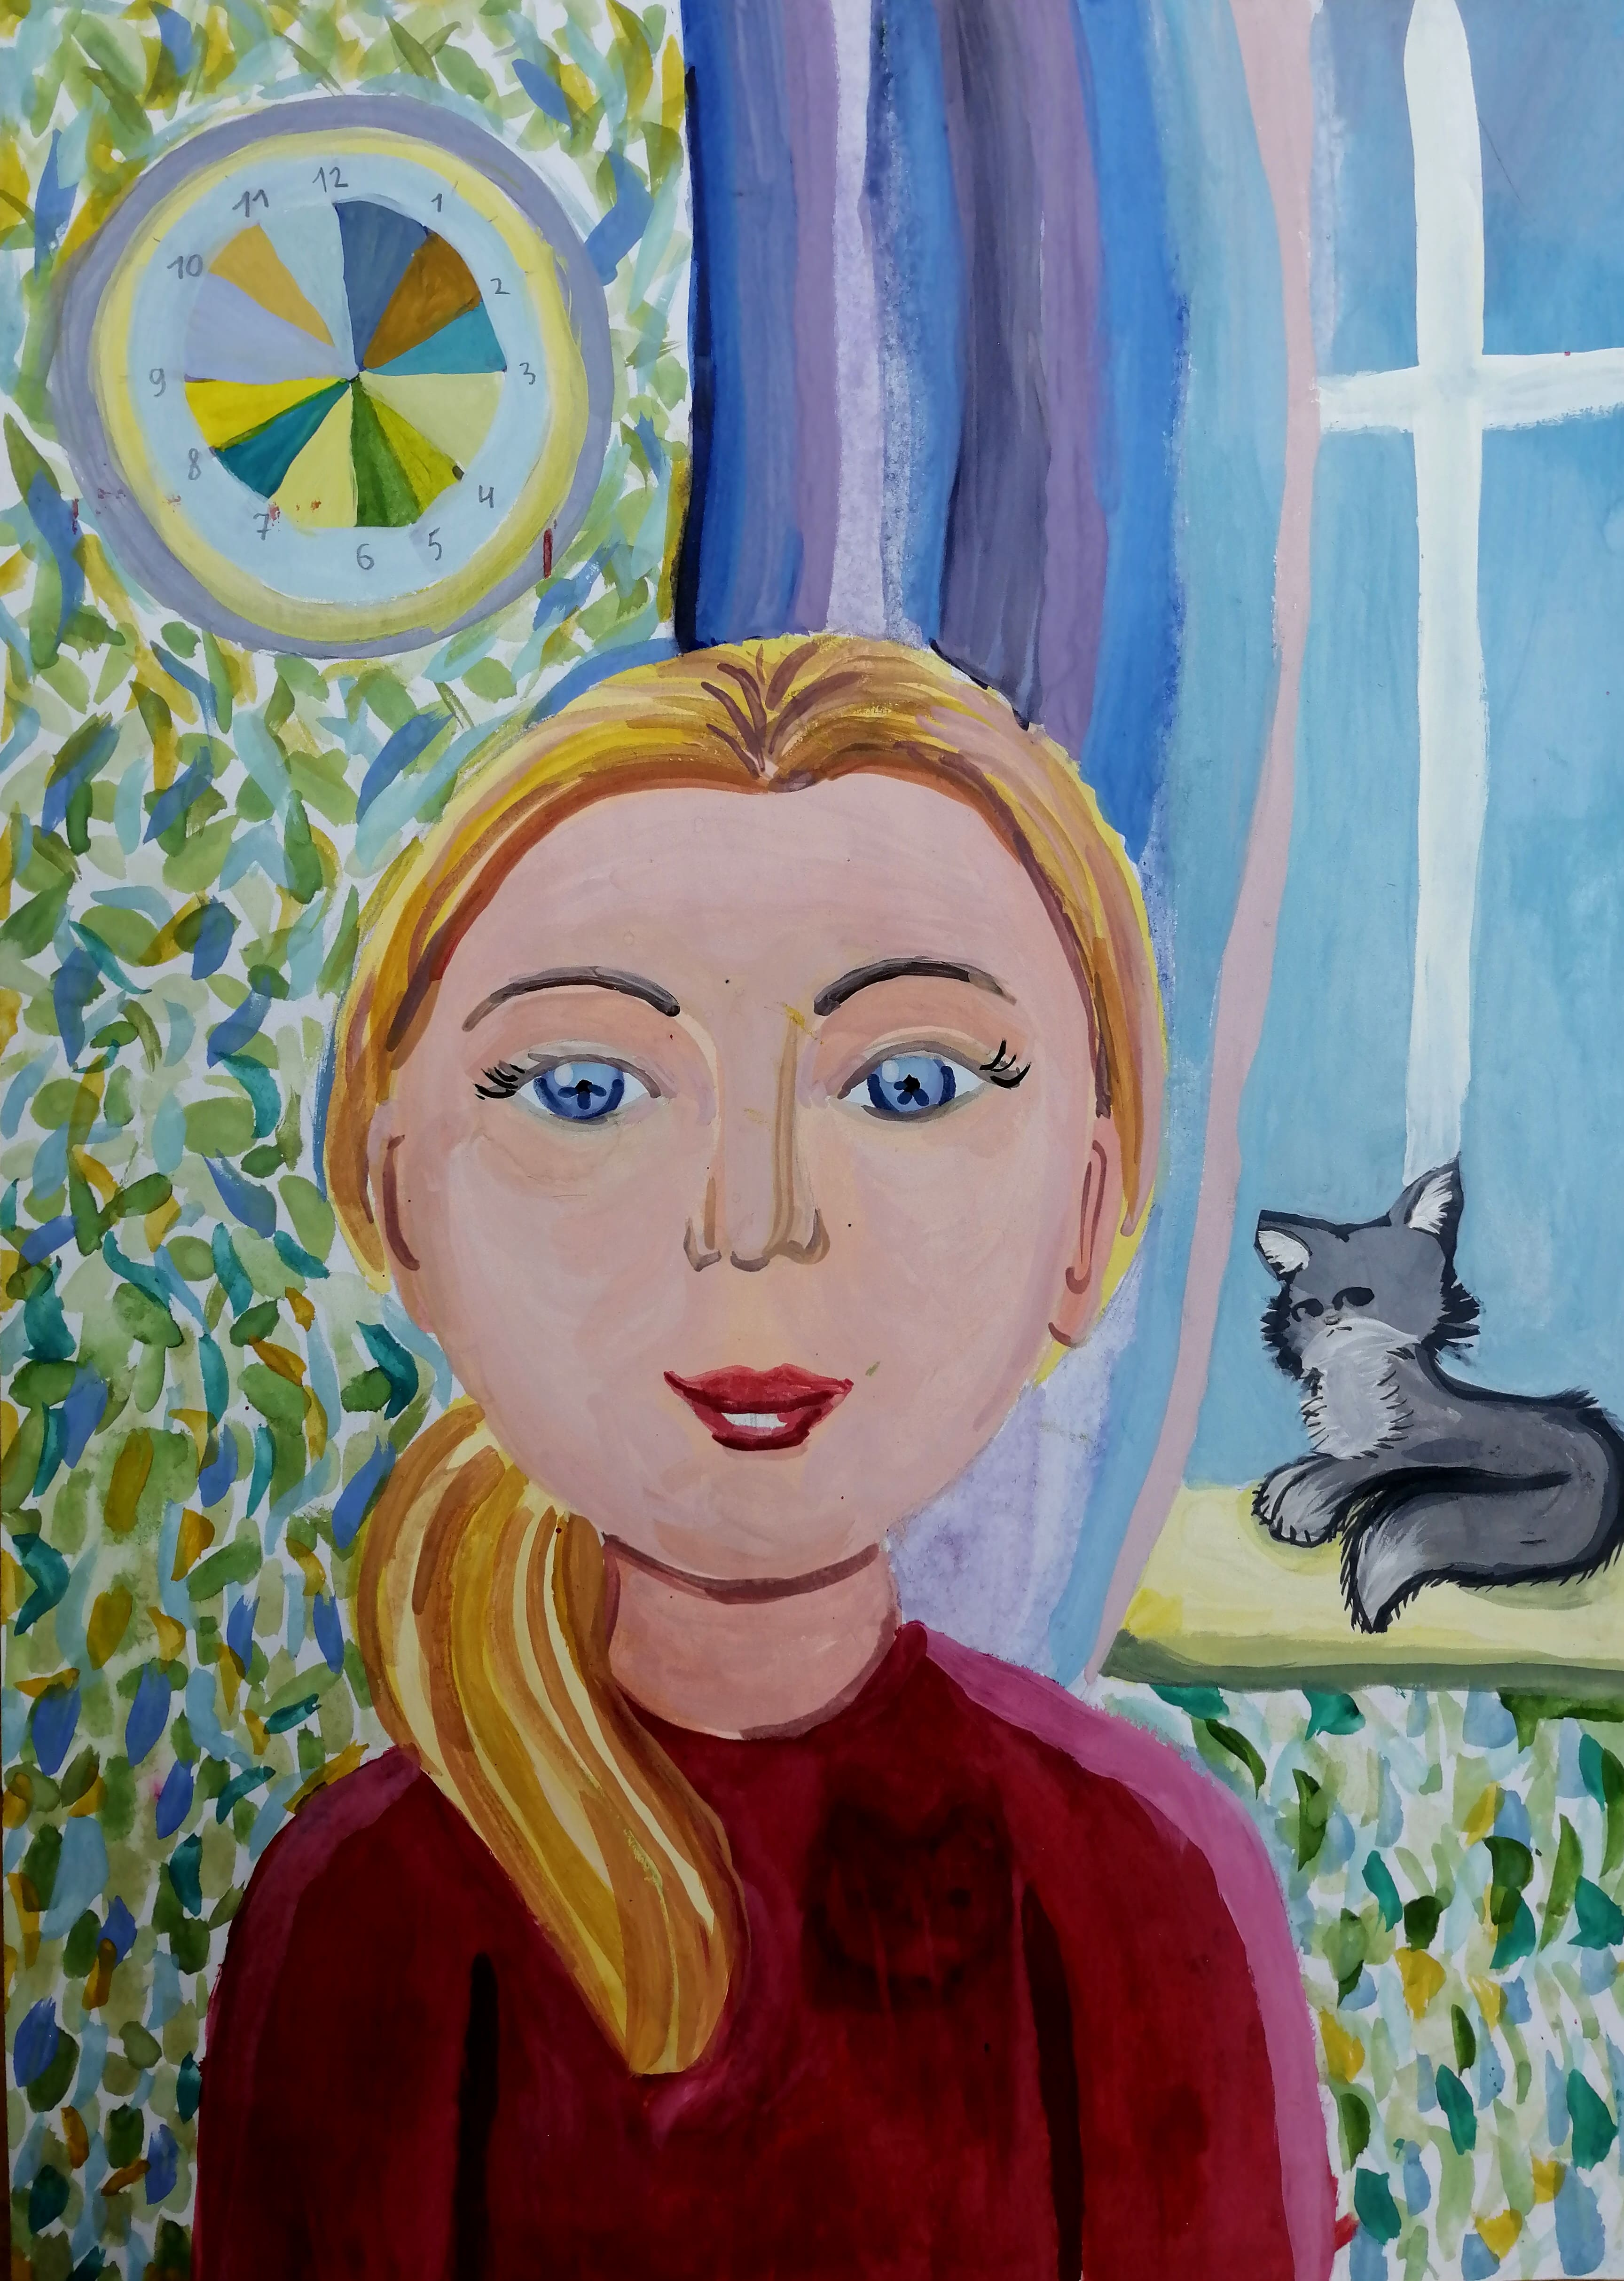 Степанова Ангелина, 11 лет